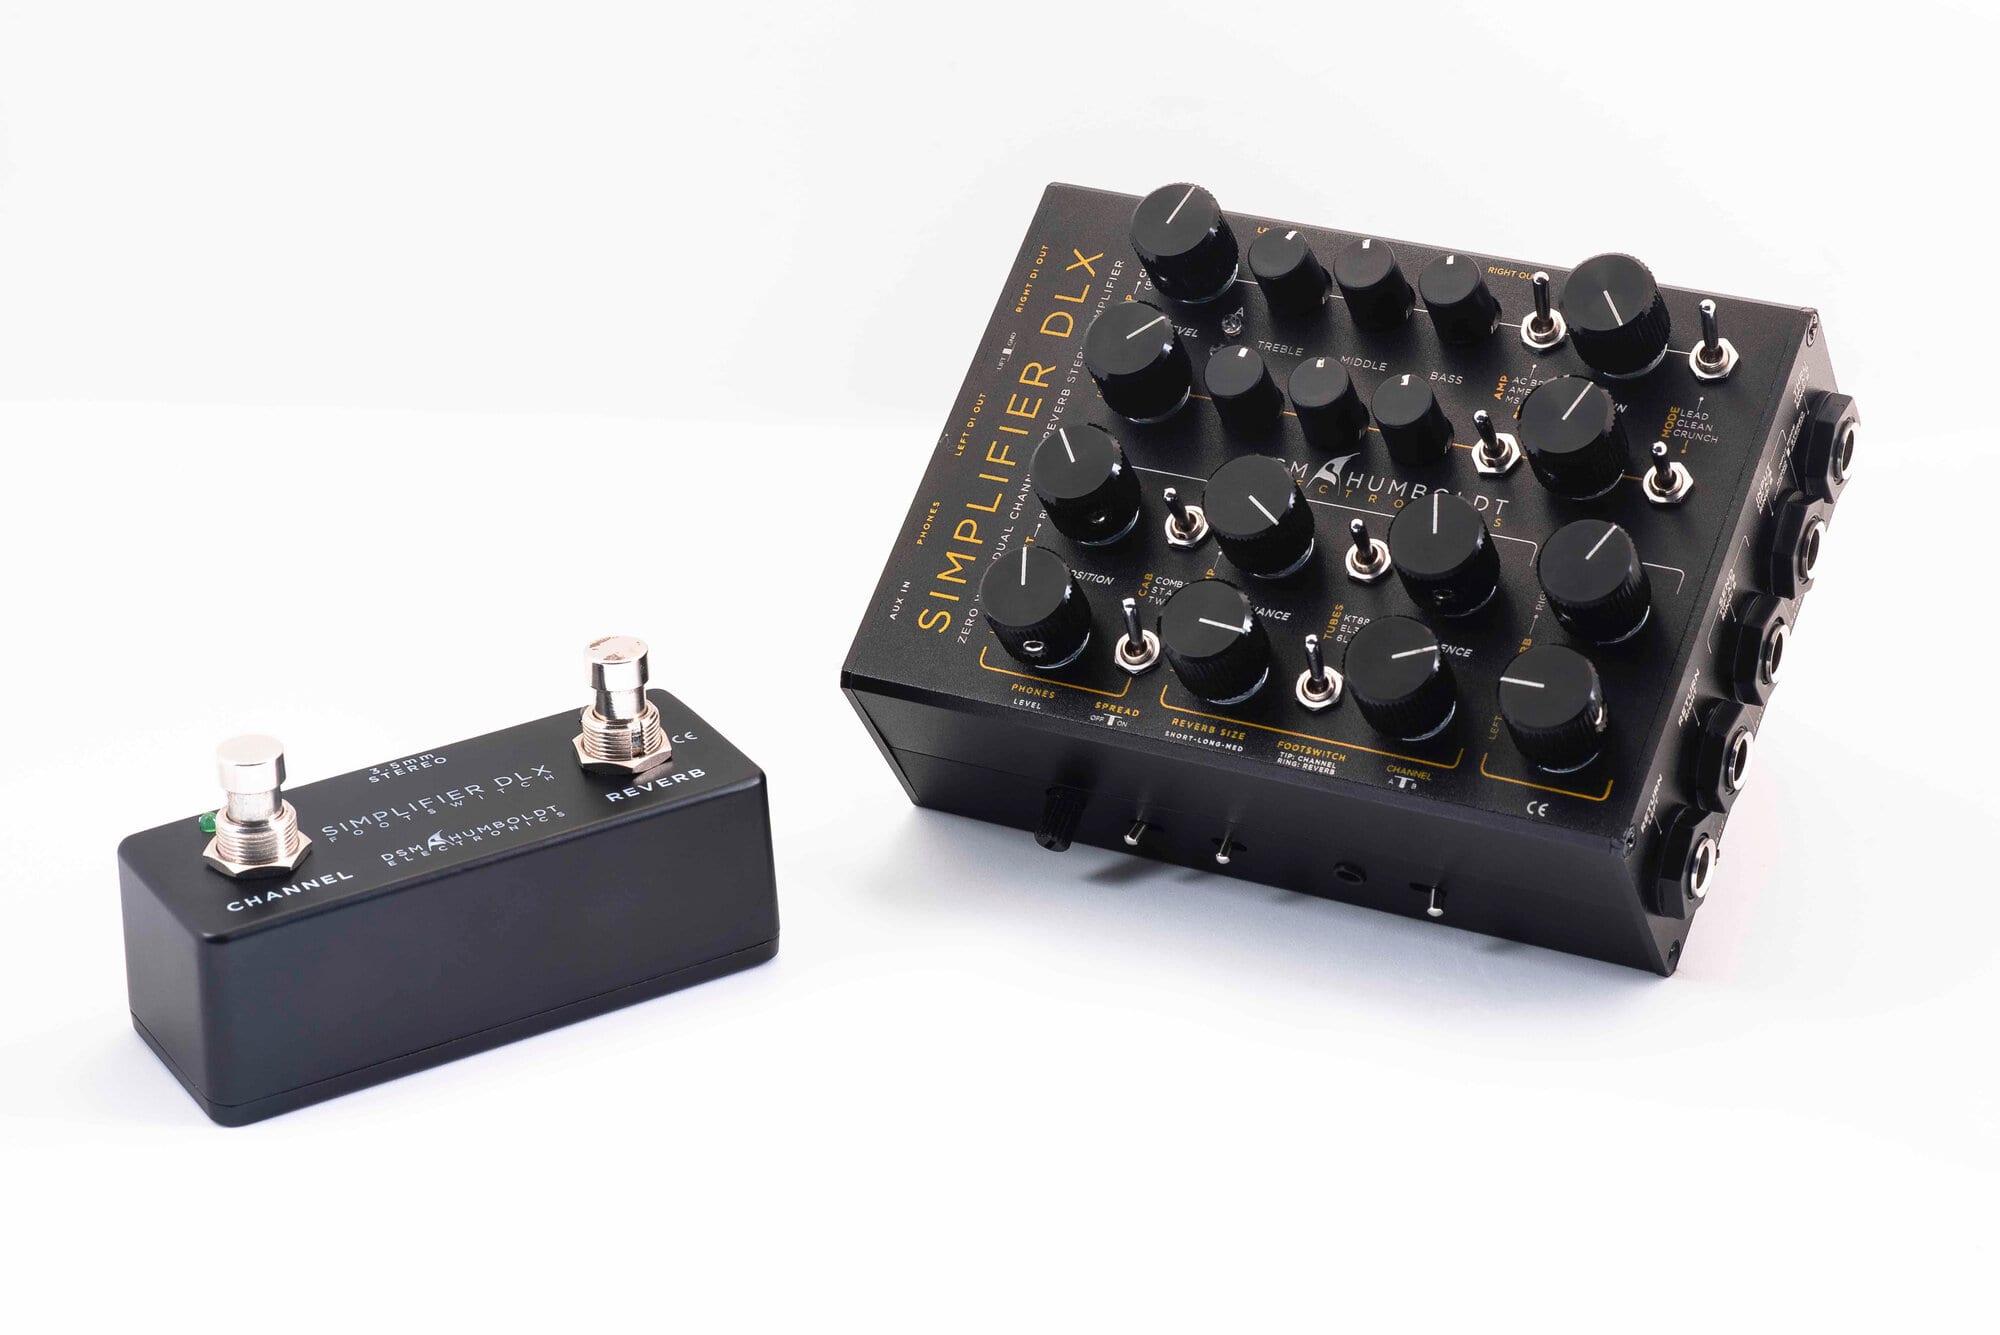 DSM & Humboldt Simplifier DLX a Zero Watt atwinn channel amp